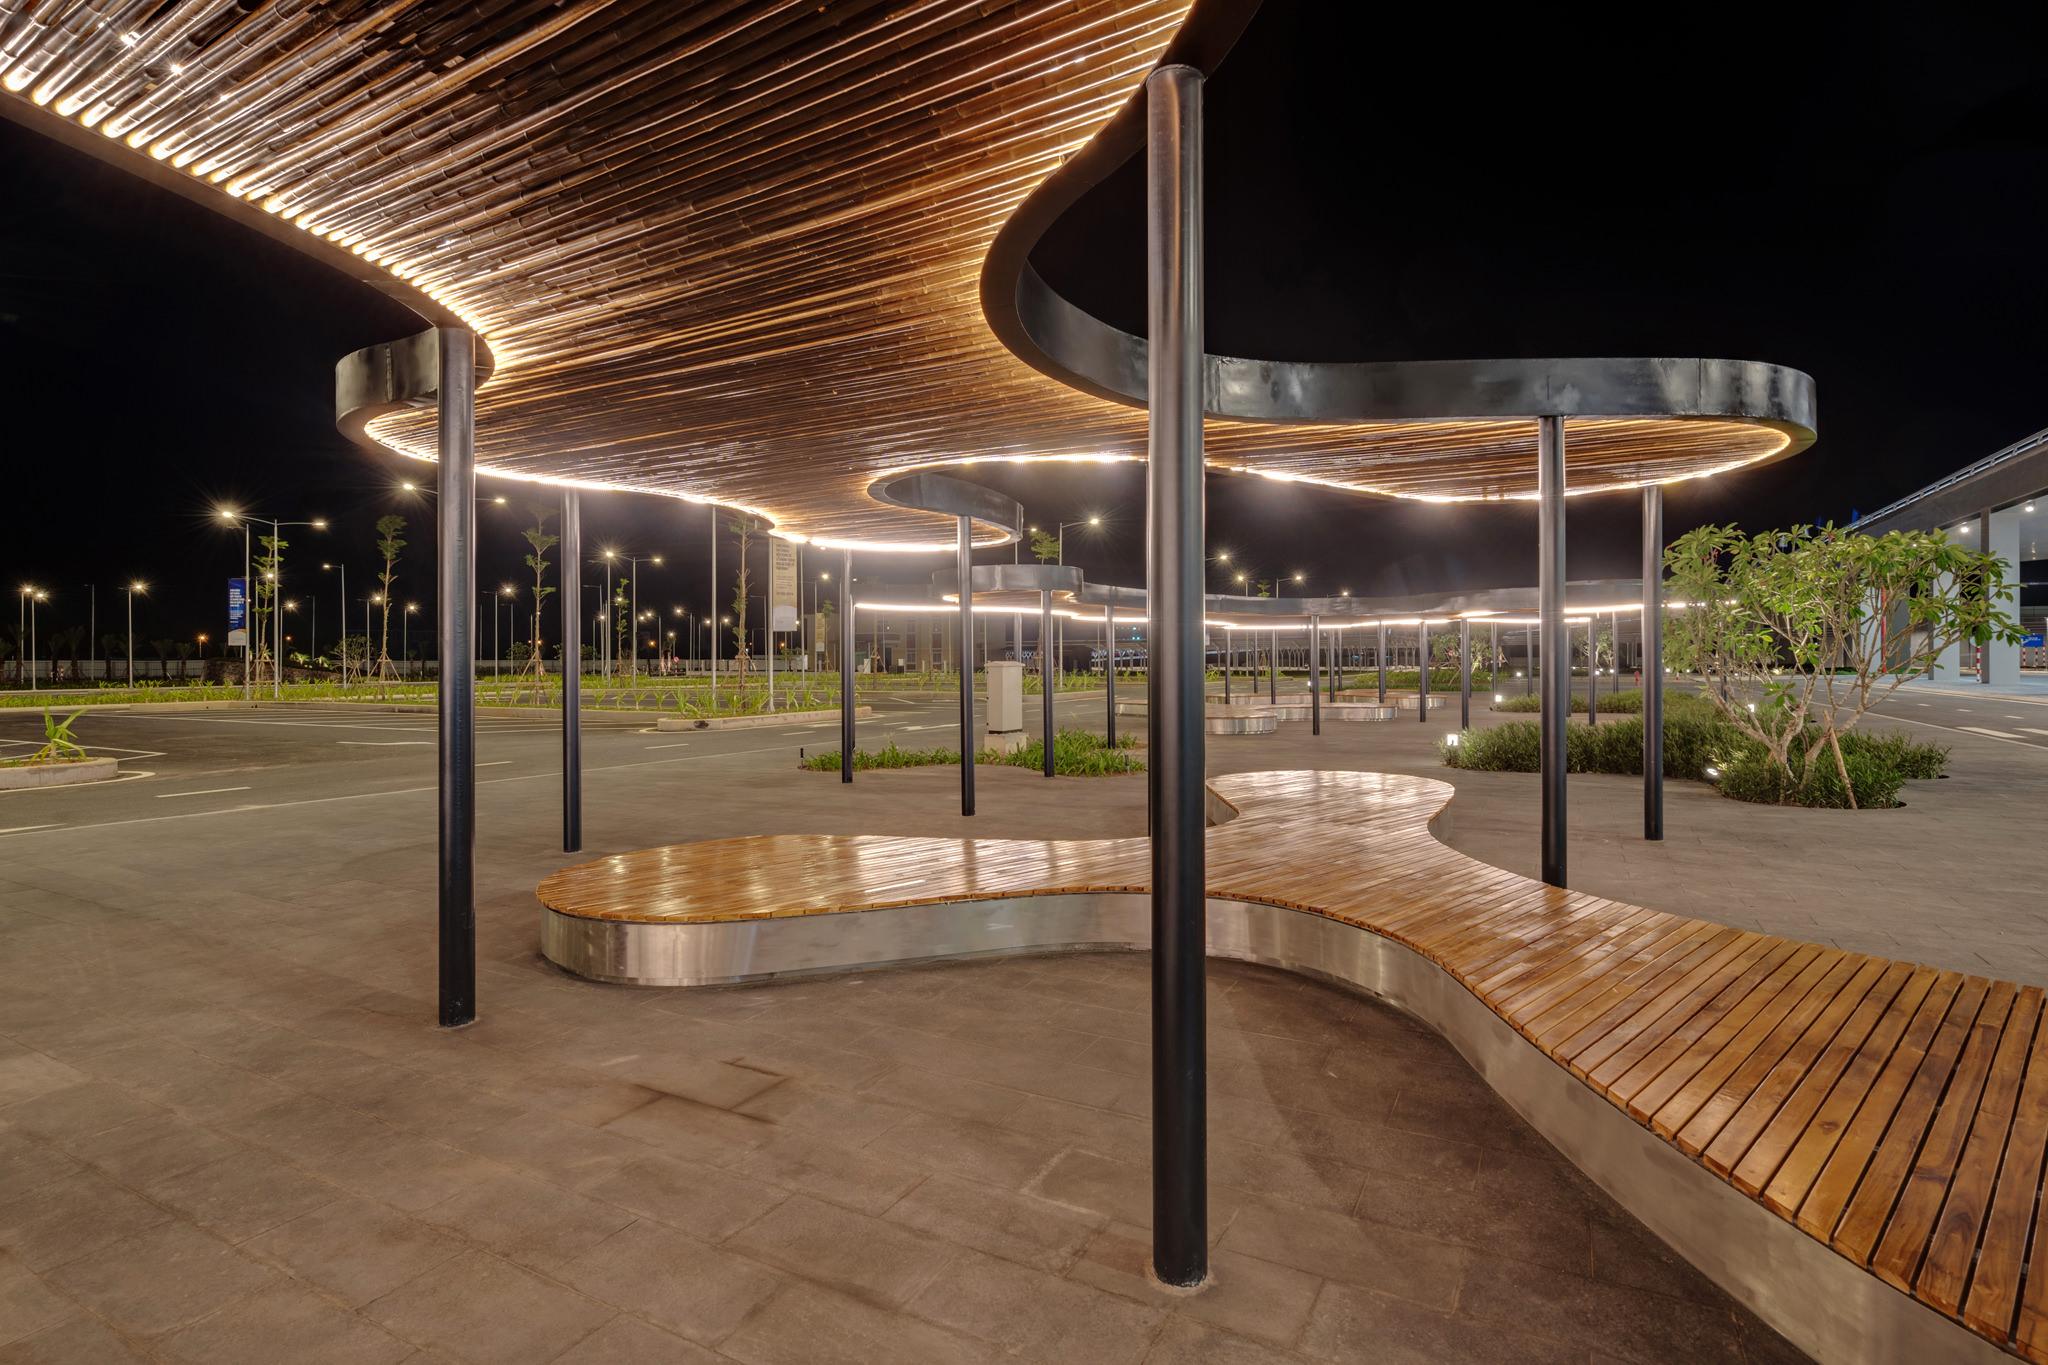 20180626 - Cam Ranh Airport - Architecture - 0389.jpg